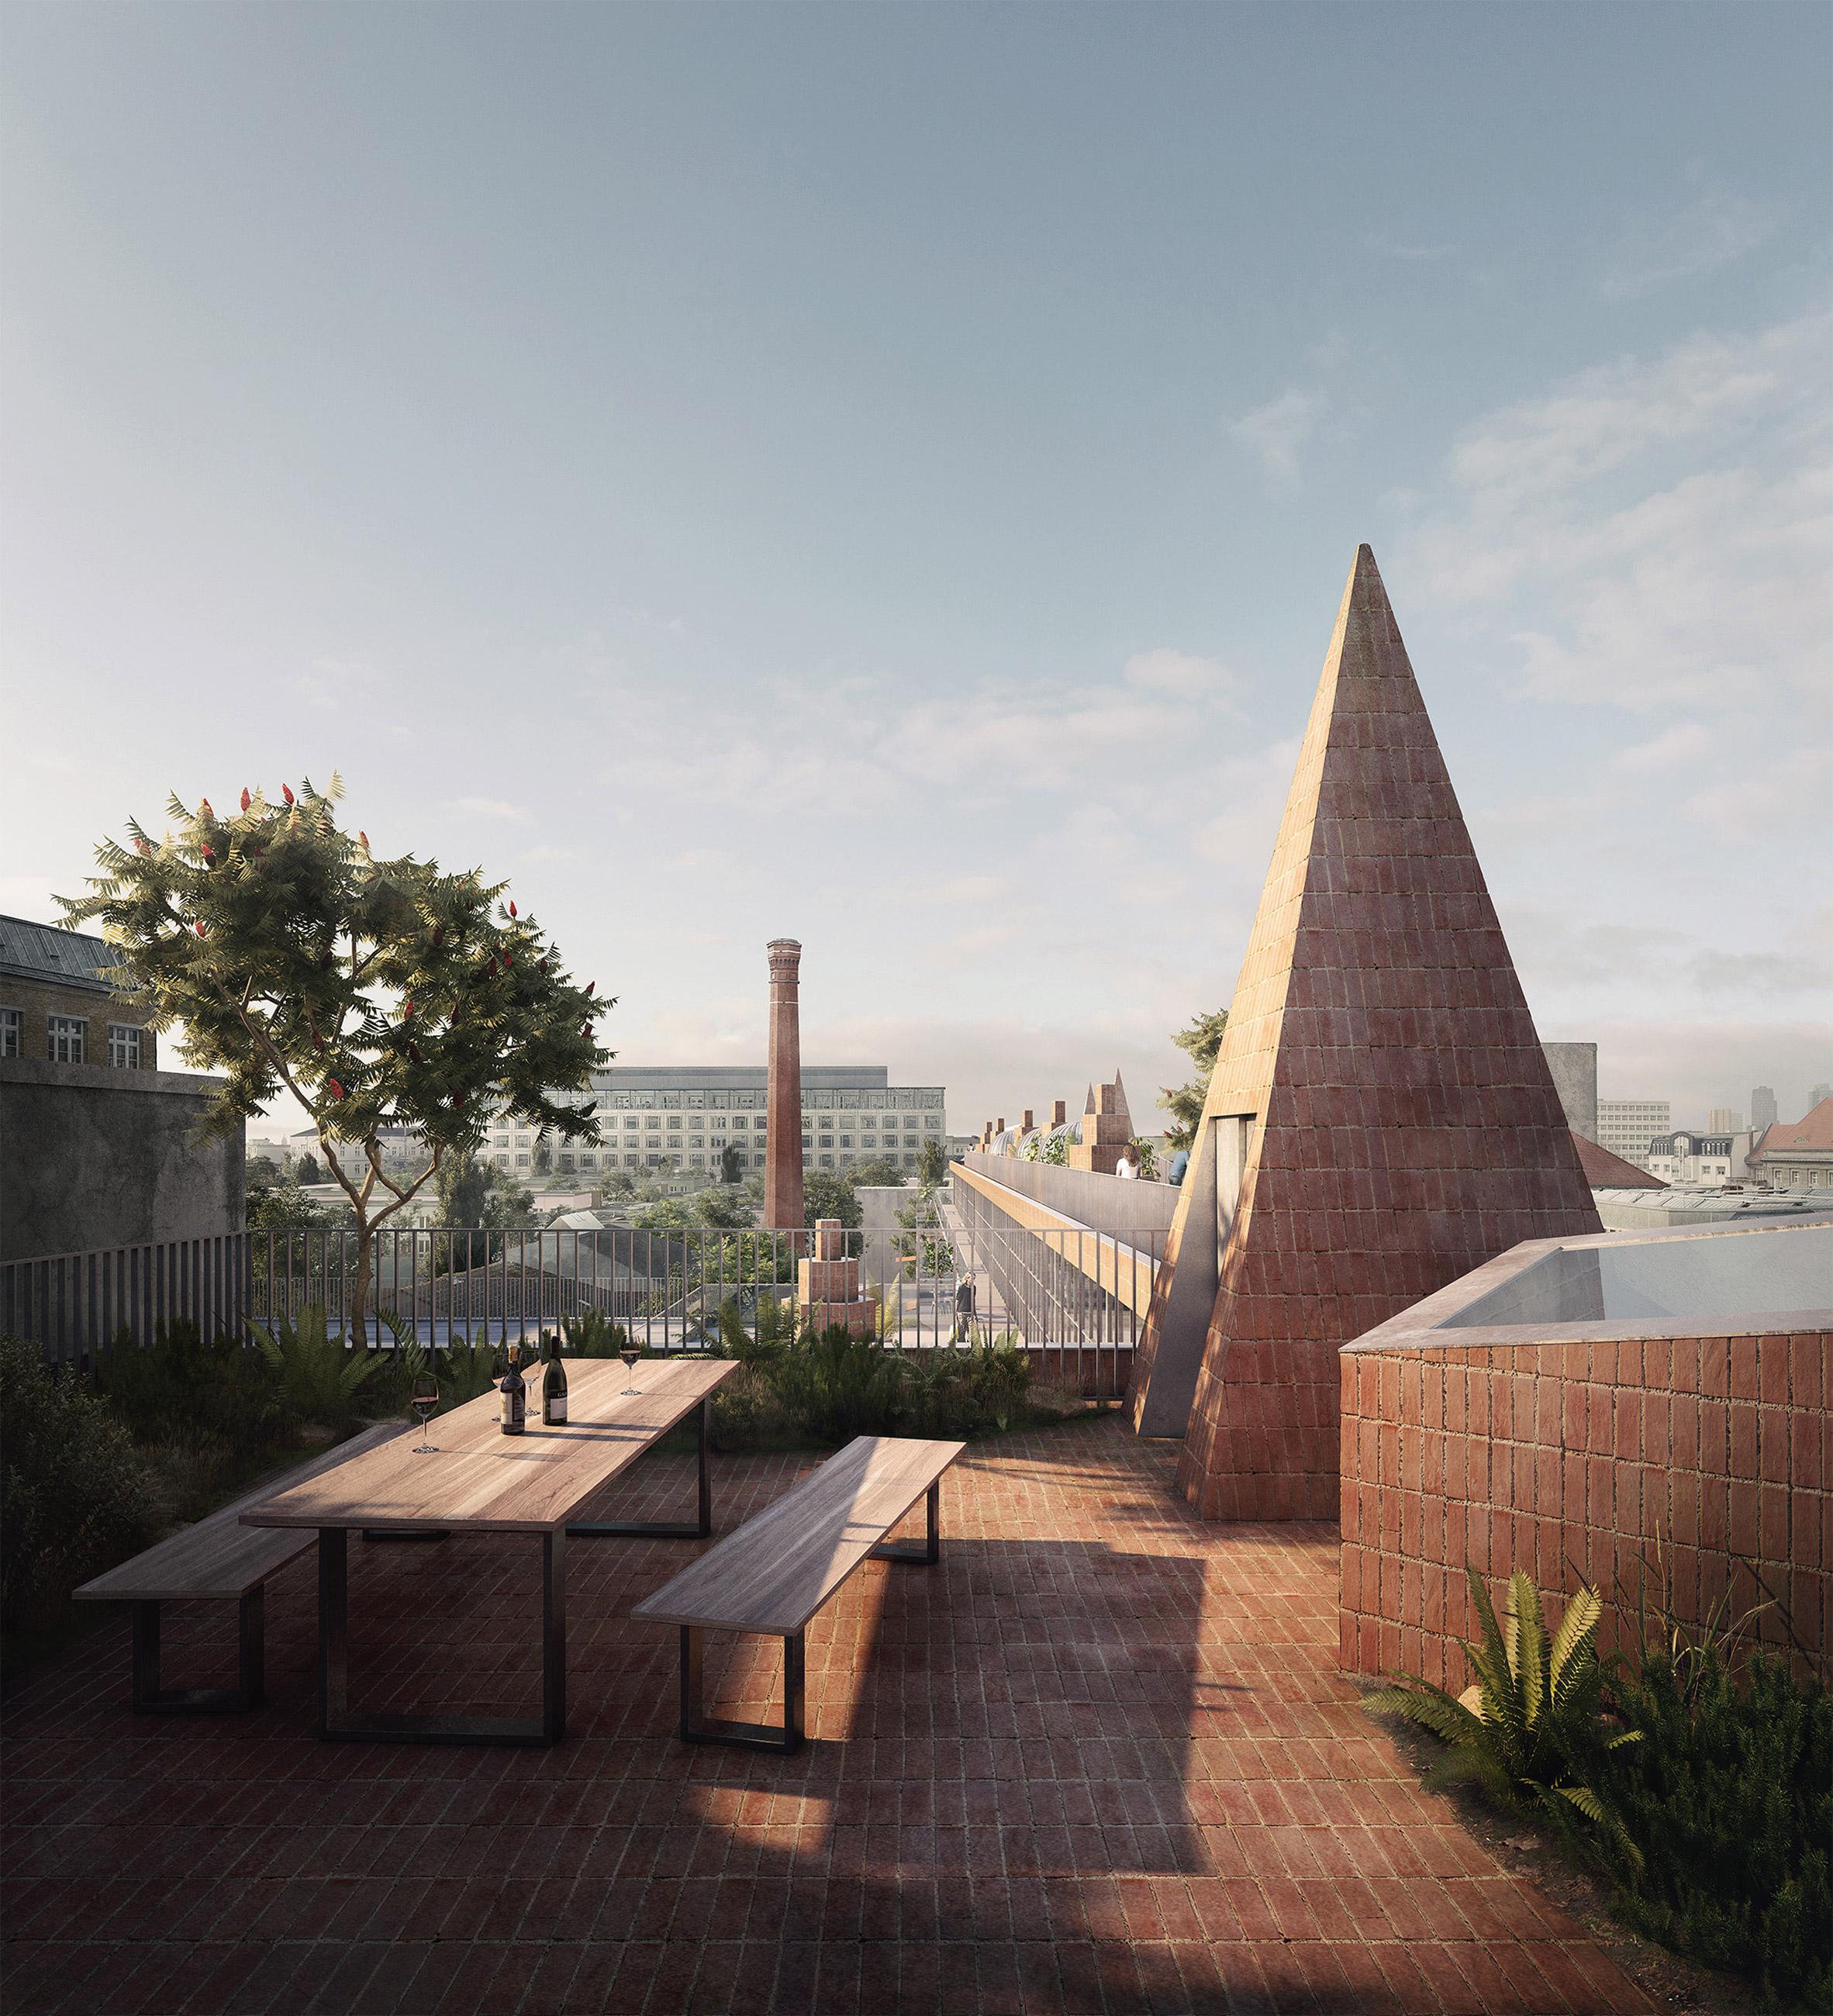 Berlin housing scheme by David Kohn Architects and Nord Studio